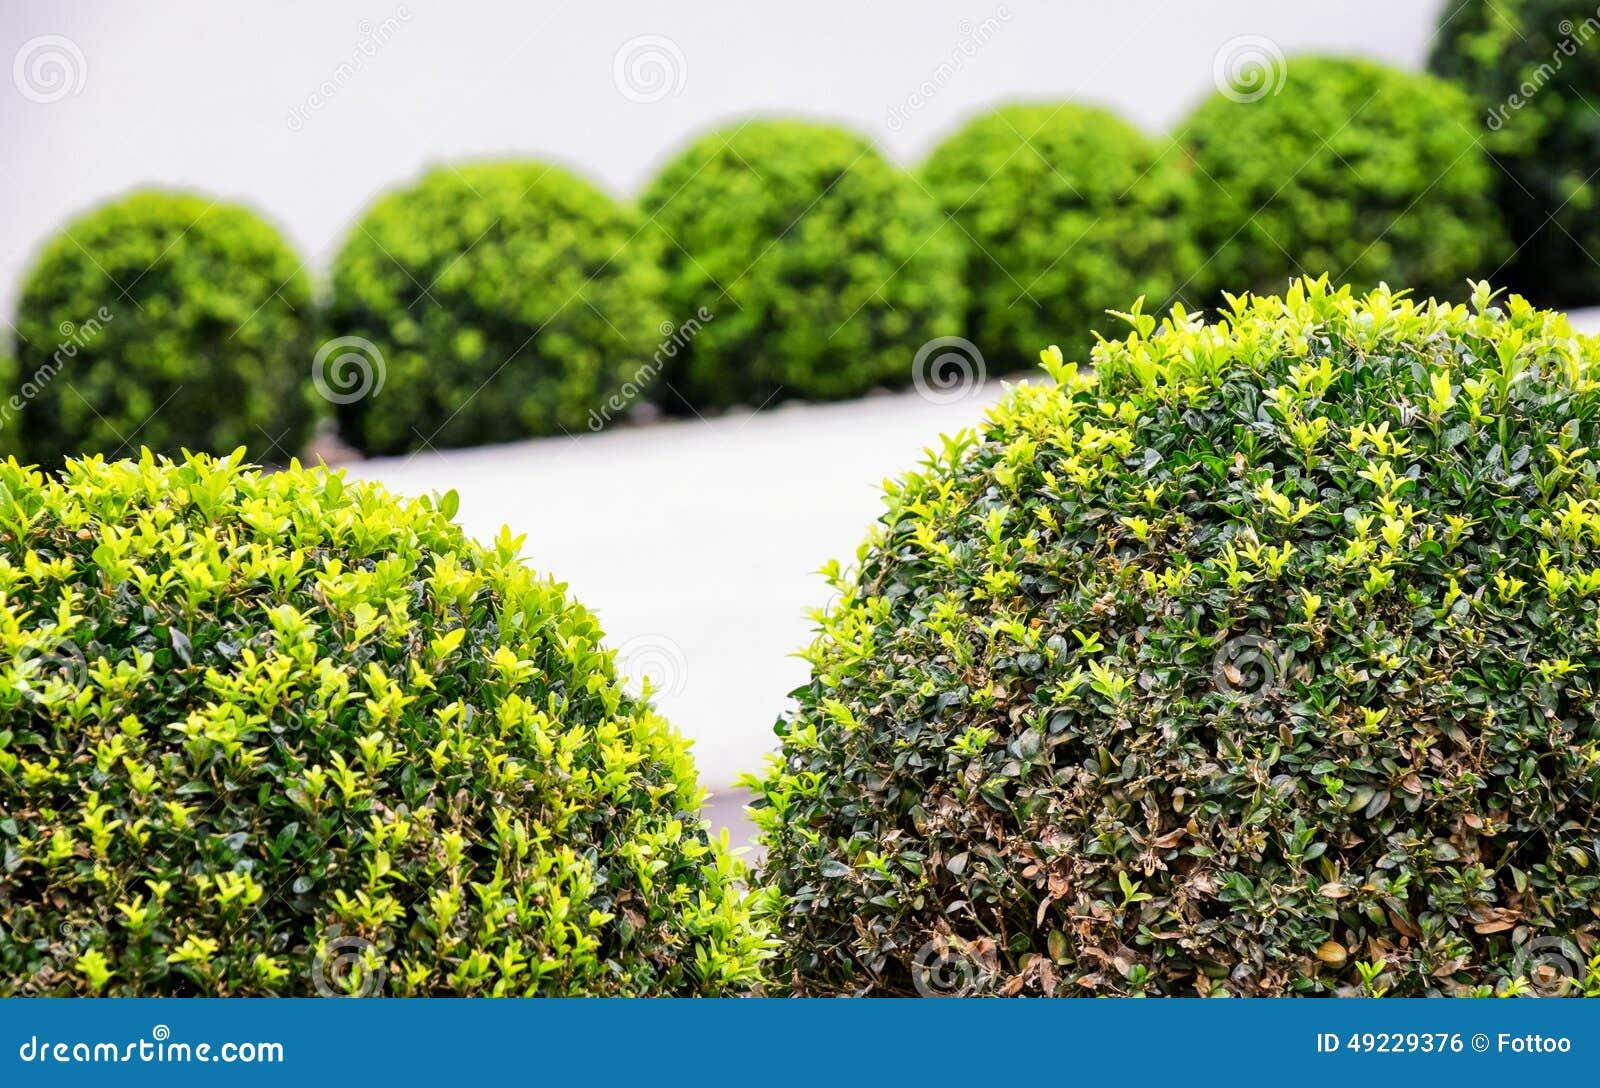 Small bushes stock photo image 49229376 for Small bushy trees